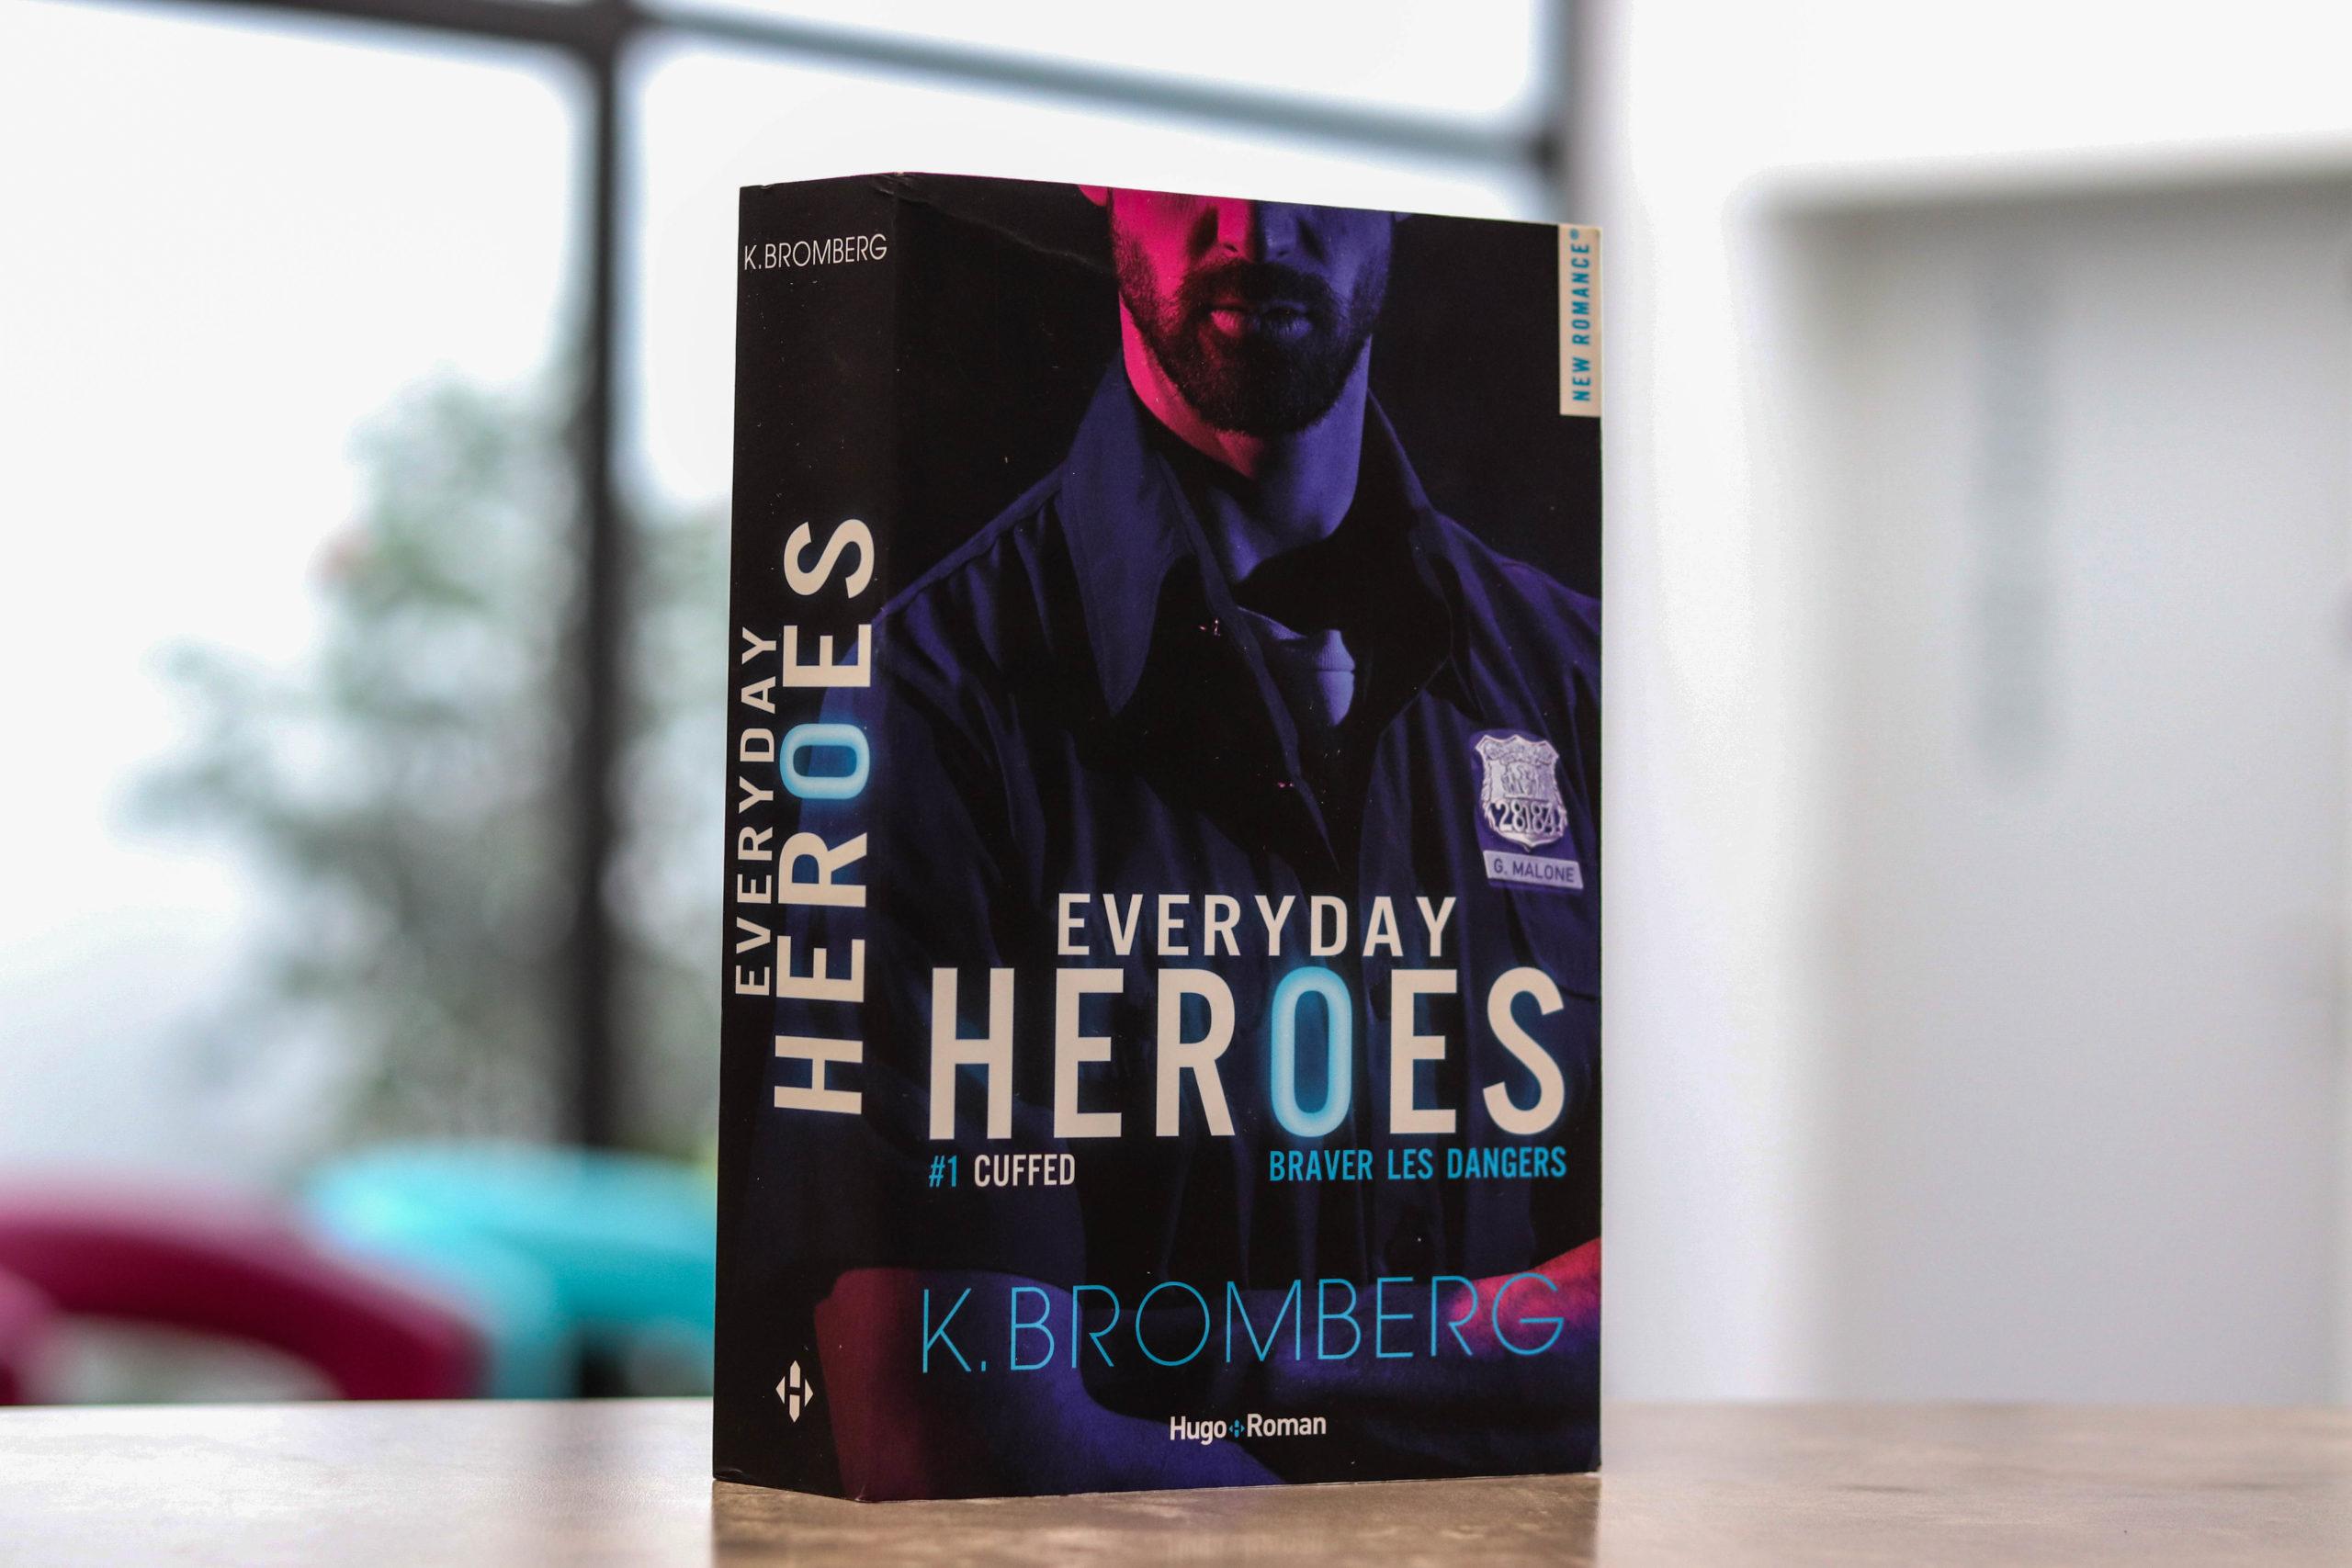 Everyday Heroes #1 – K. Bromberg